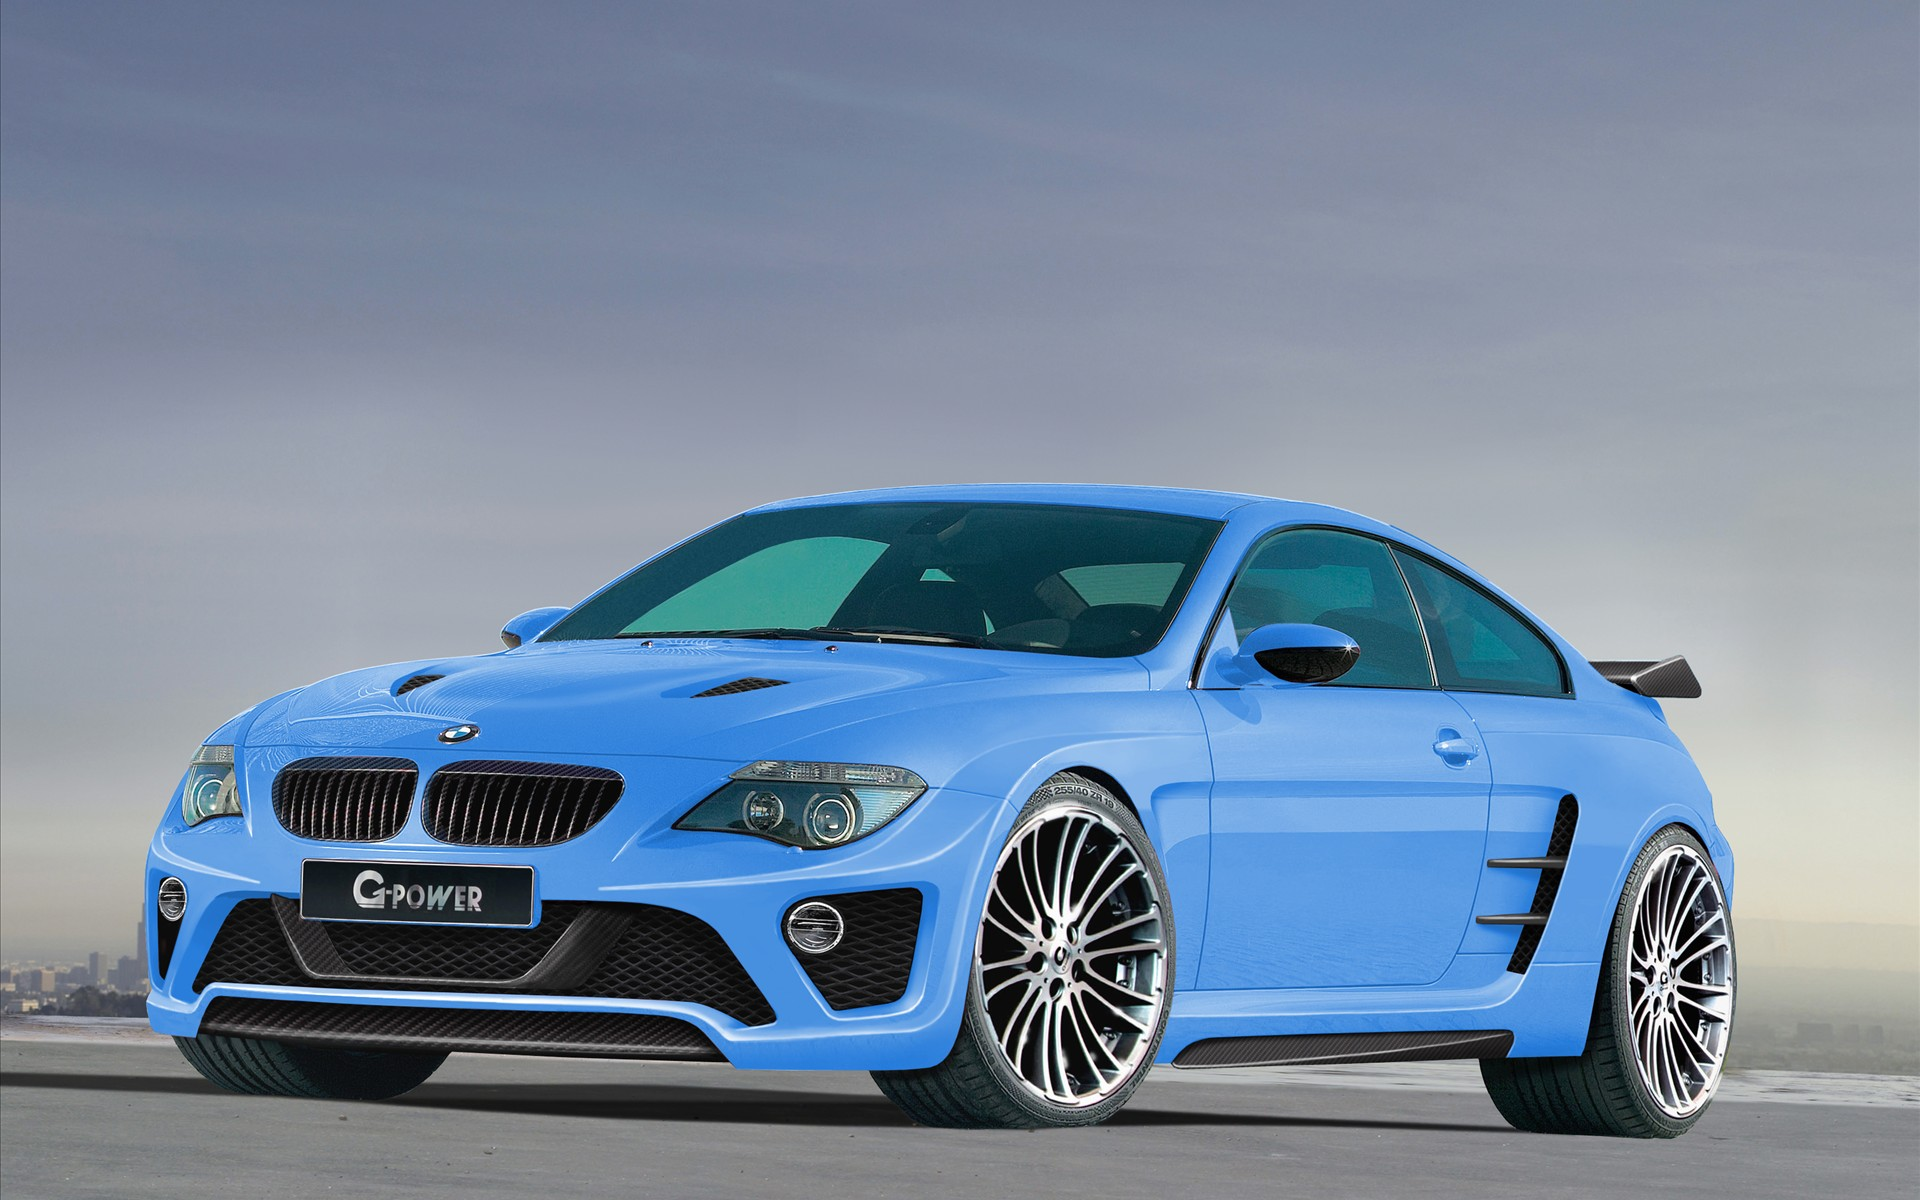 Fahrzeuge - BMW  - Bmw M6 Hurricane Cs G-power Hintergrundbild